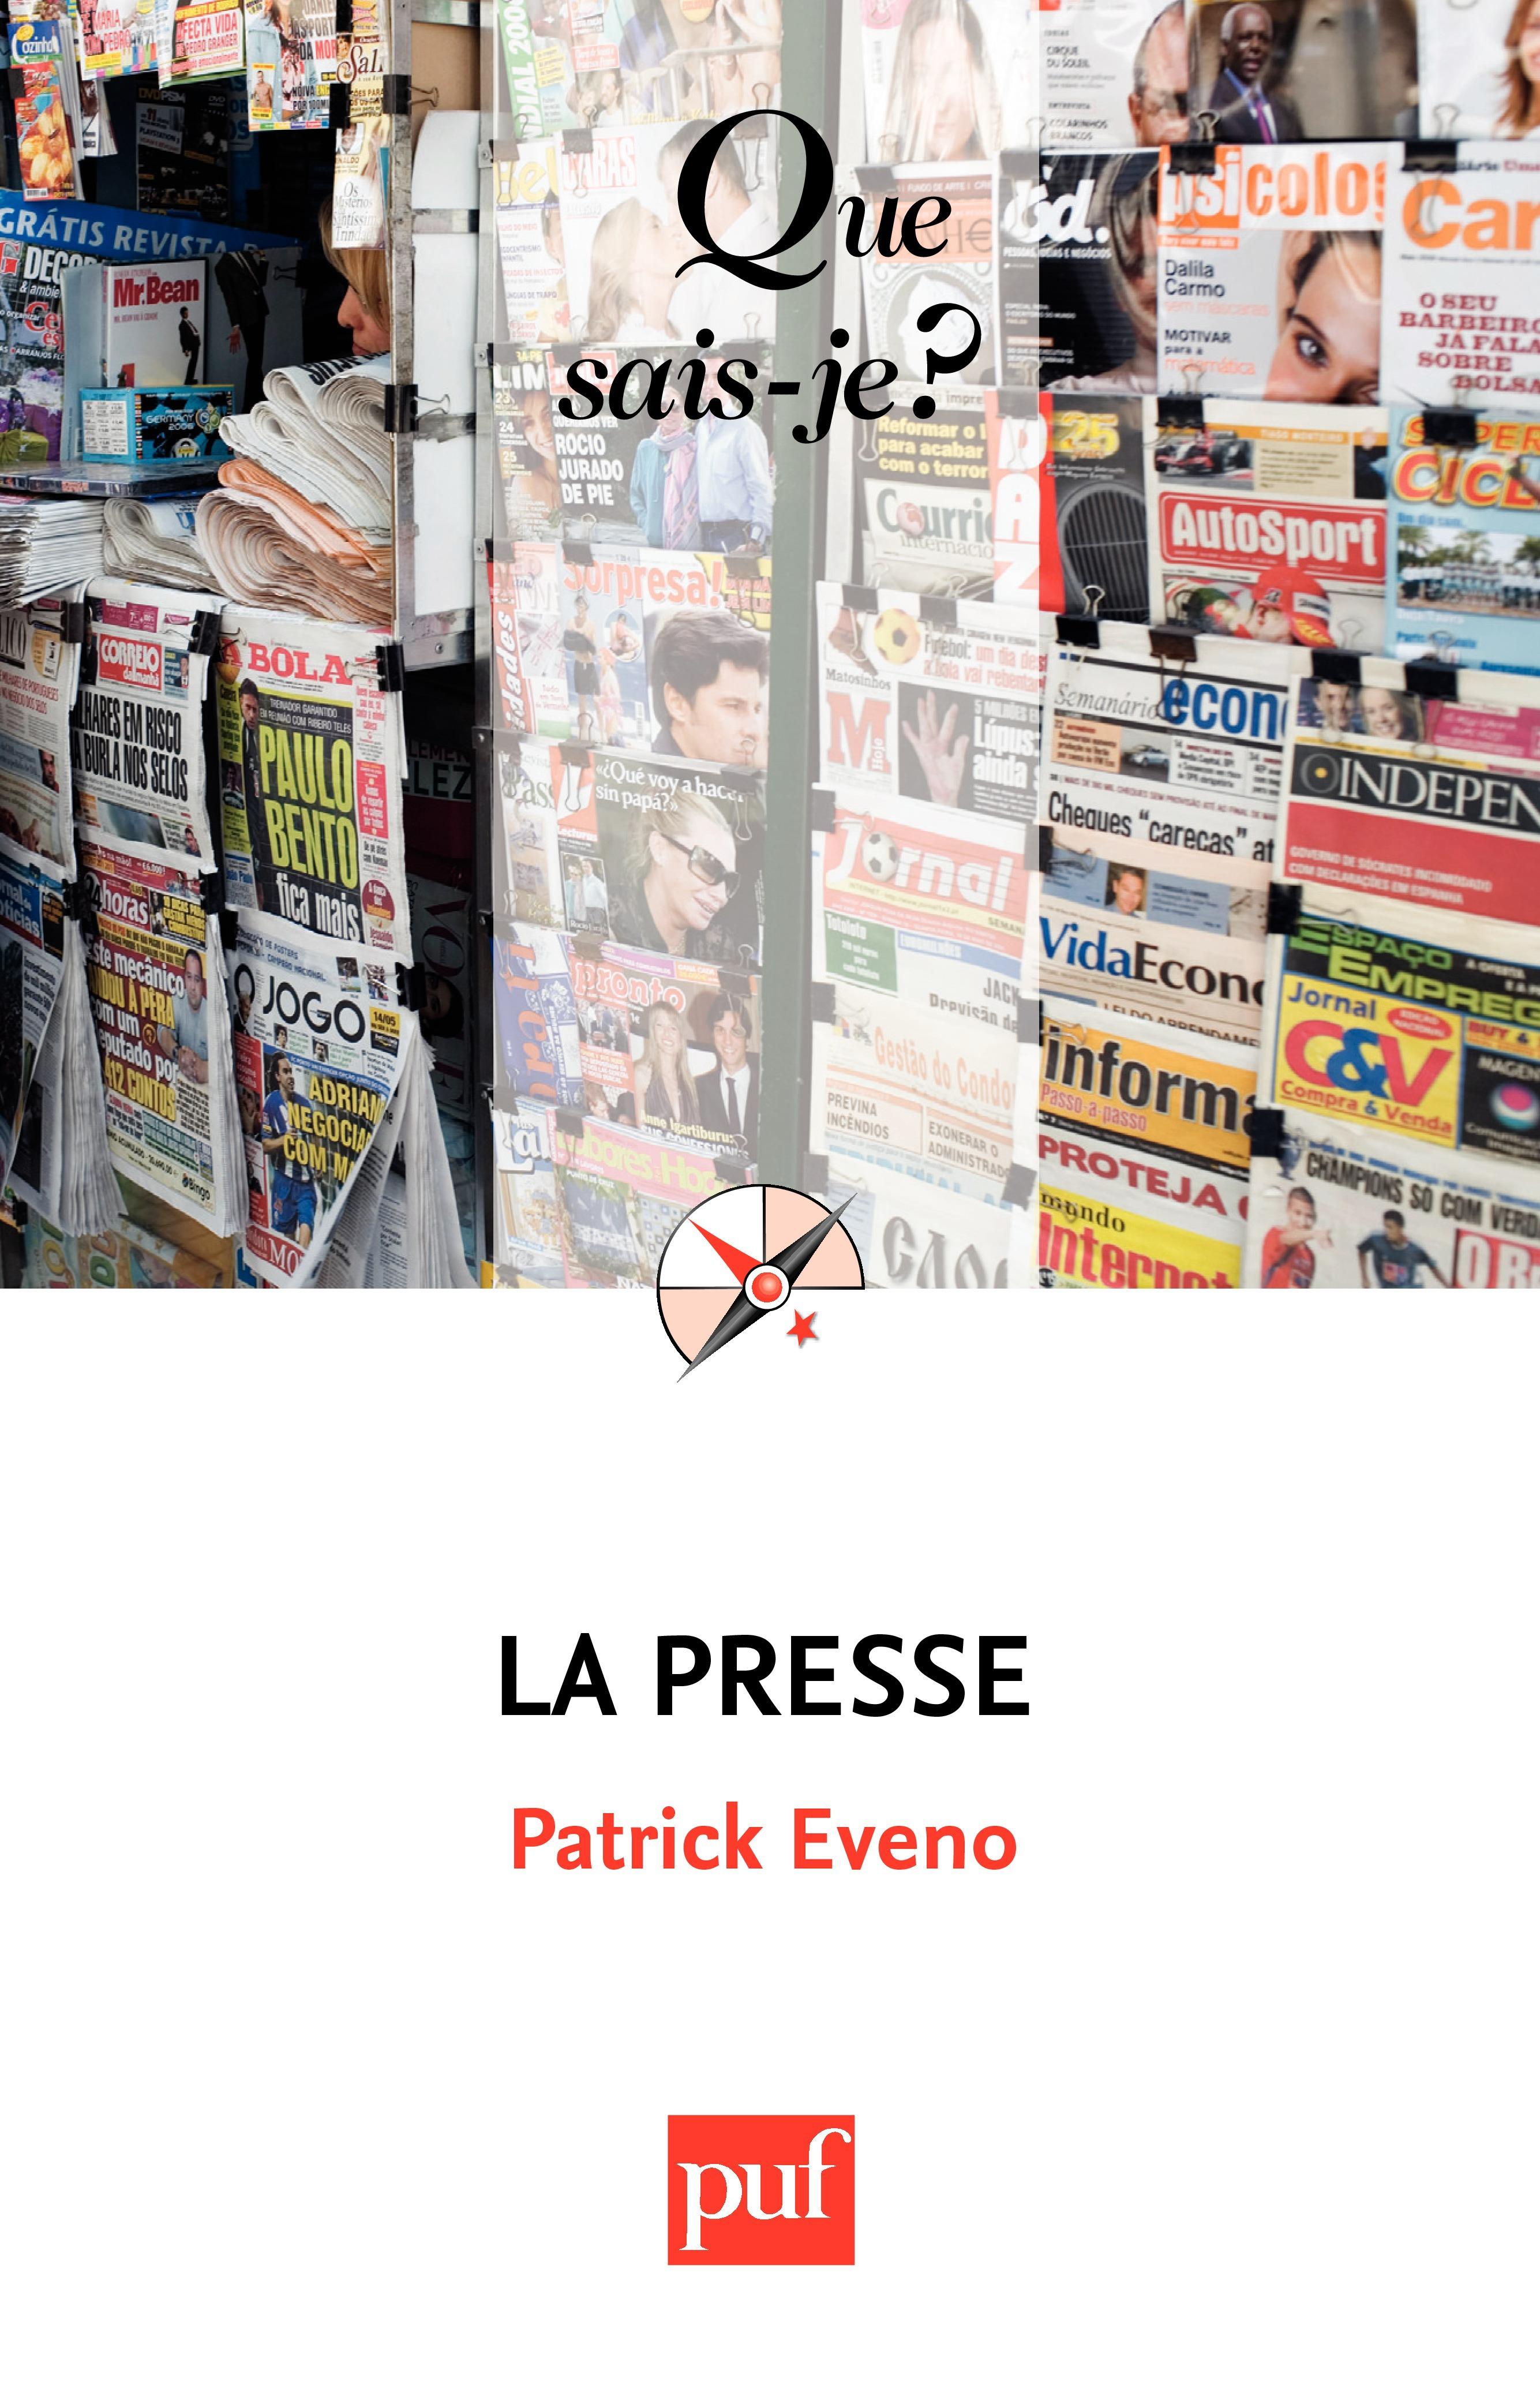 Patrick Eveno La presse